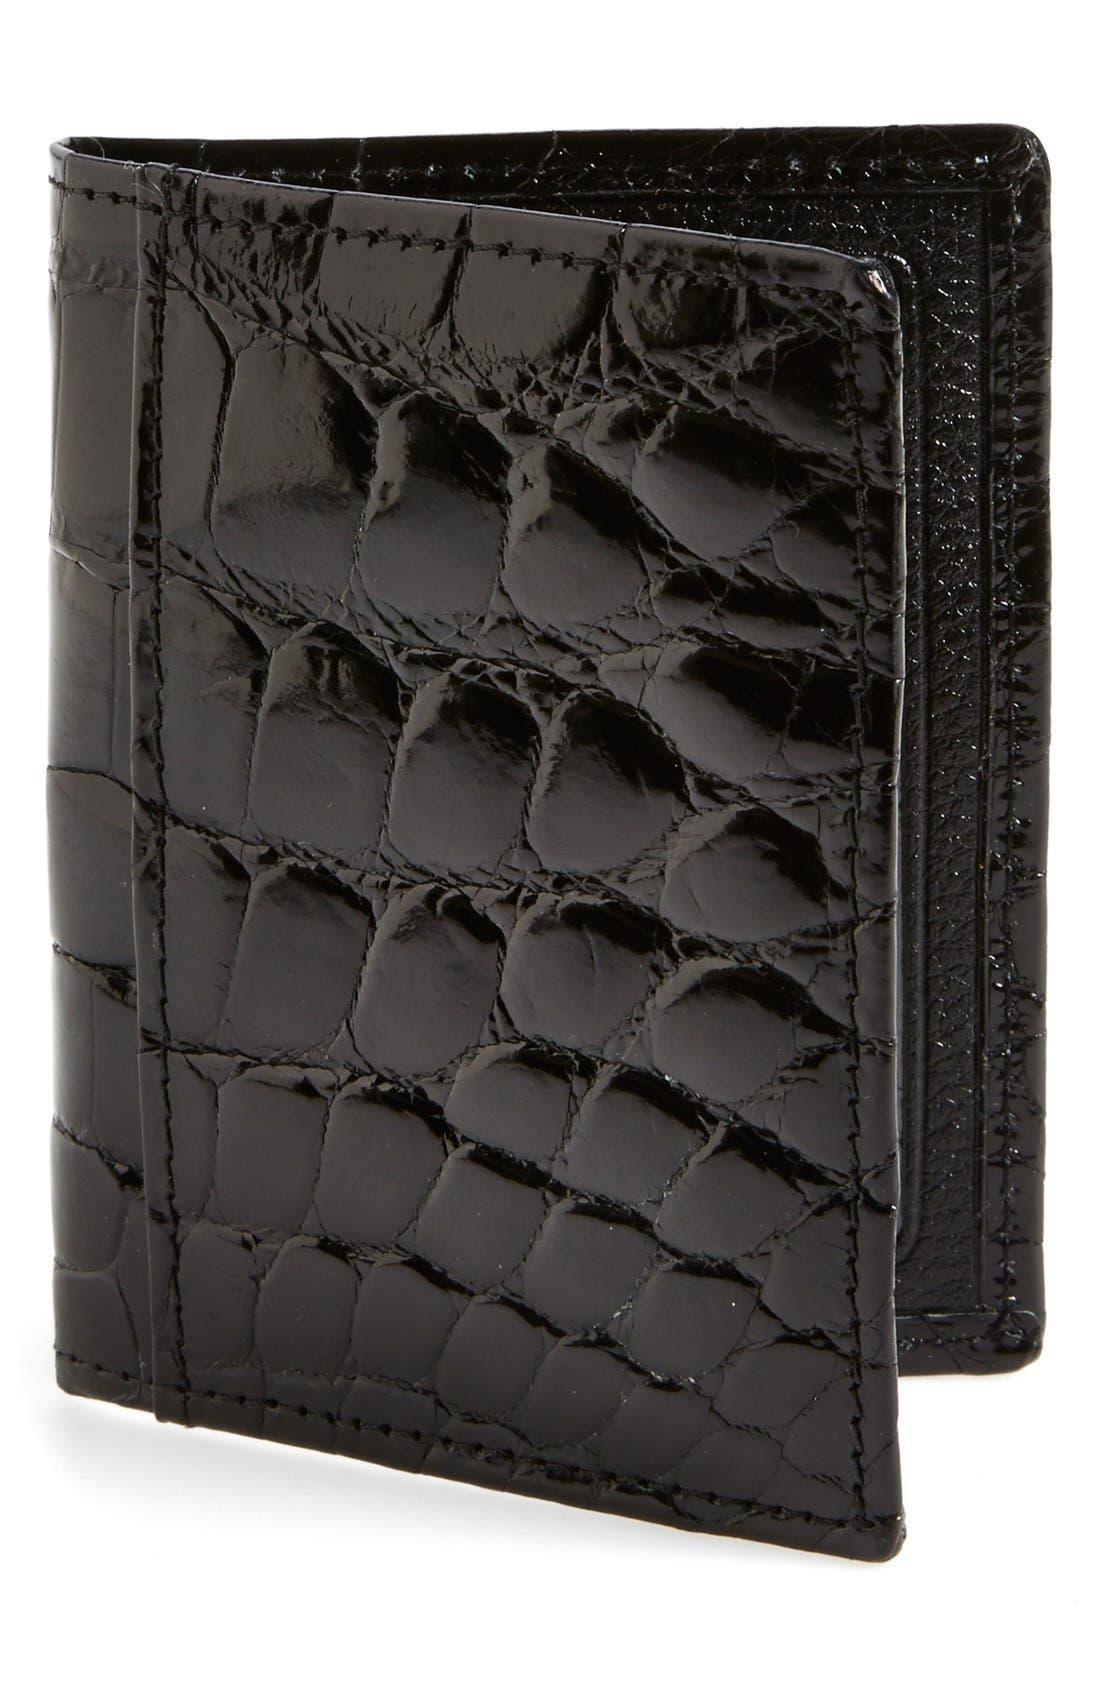 'Joseph' Genuine American Alligator Leather ID Wallet,                         Main,                         color, Black